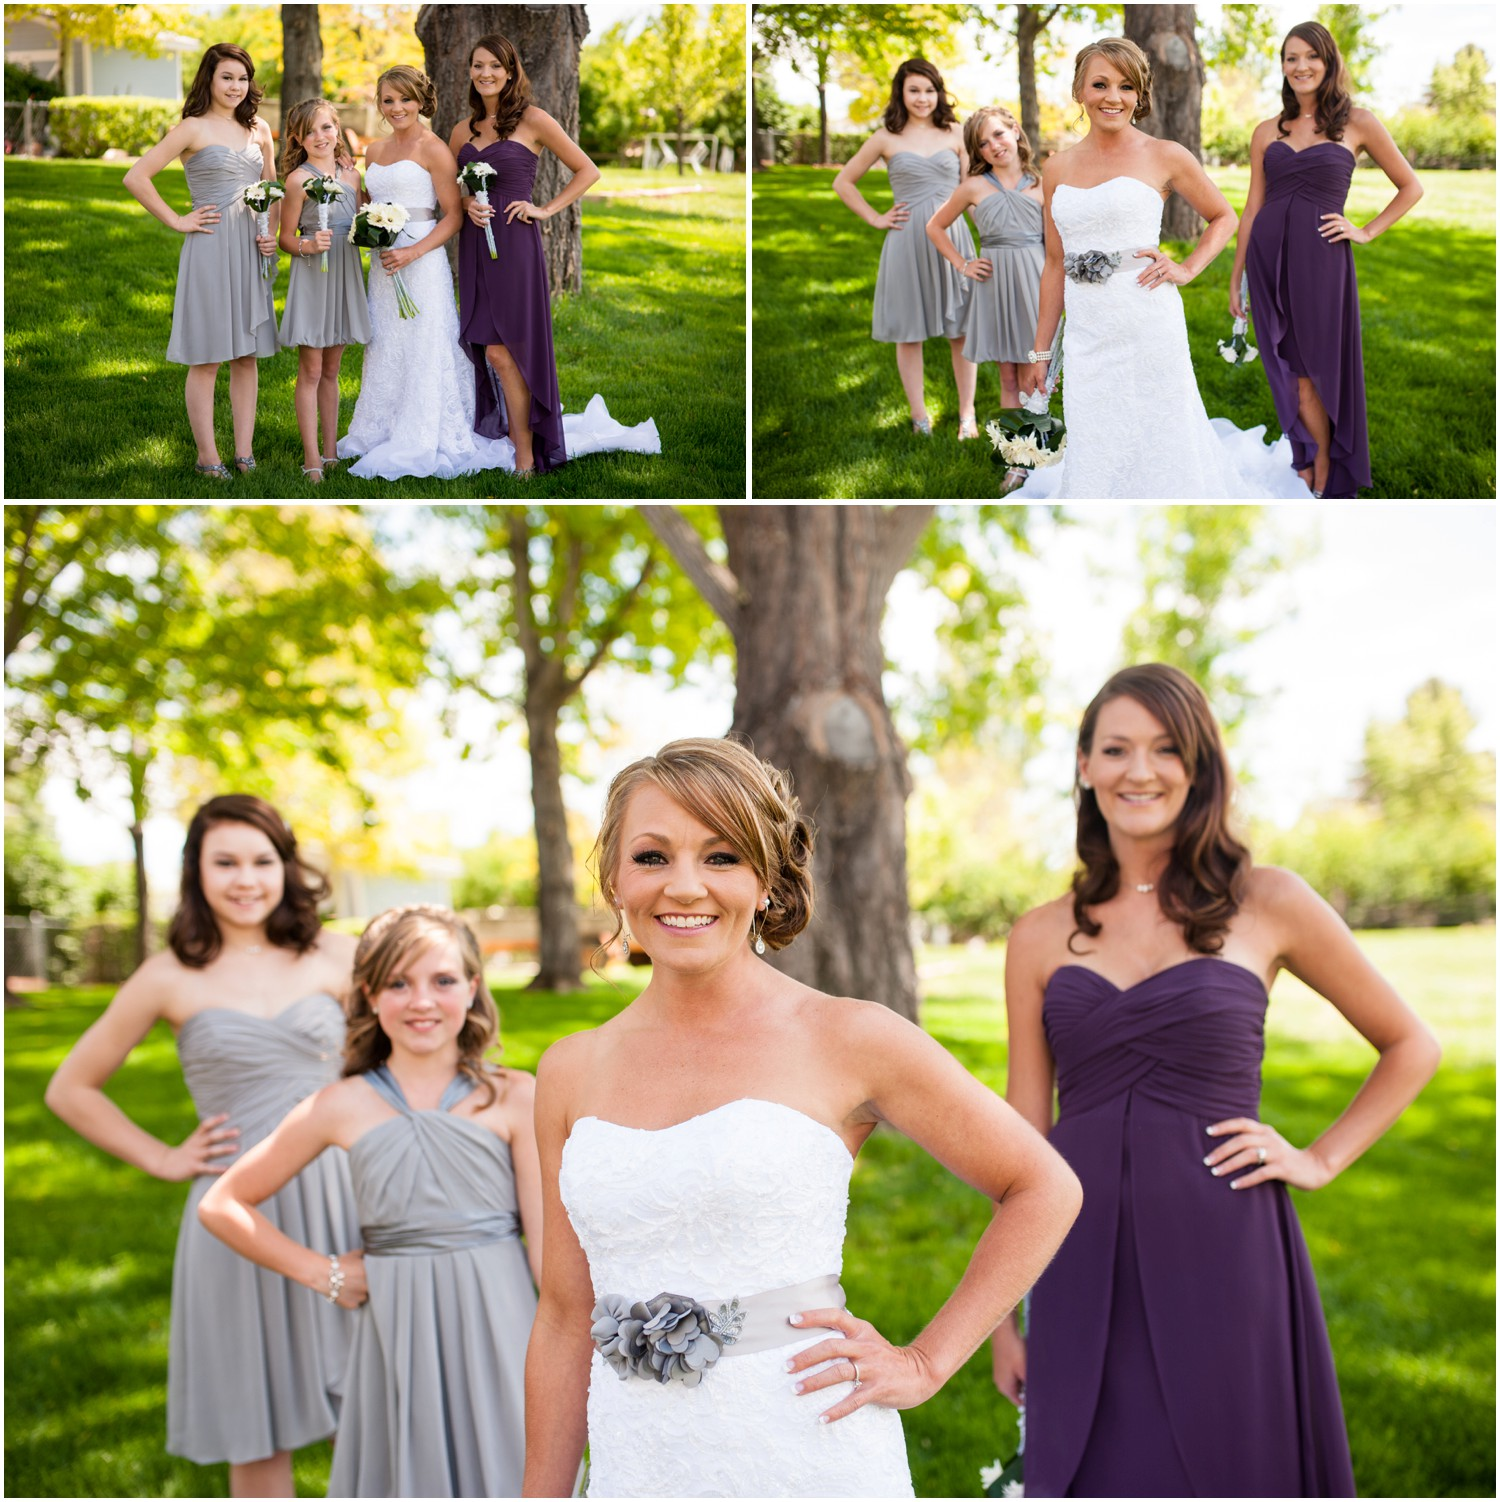 Windsor-colorado-backyard-wedding-photography-_0008.jpg